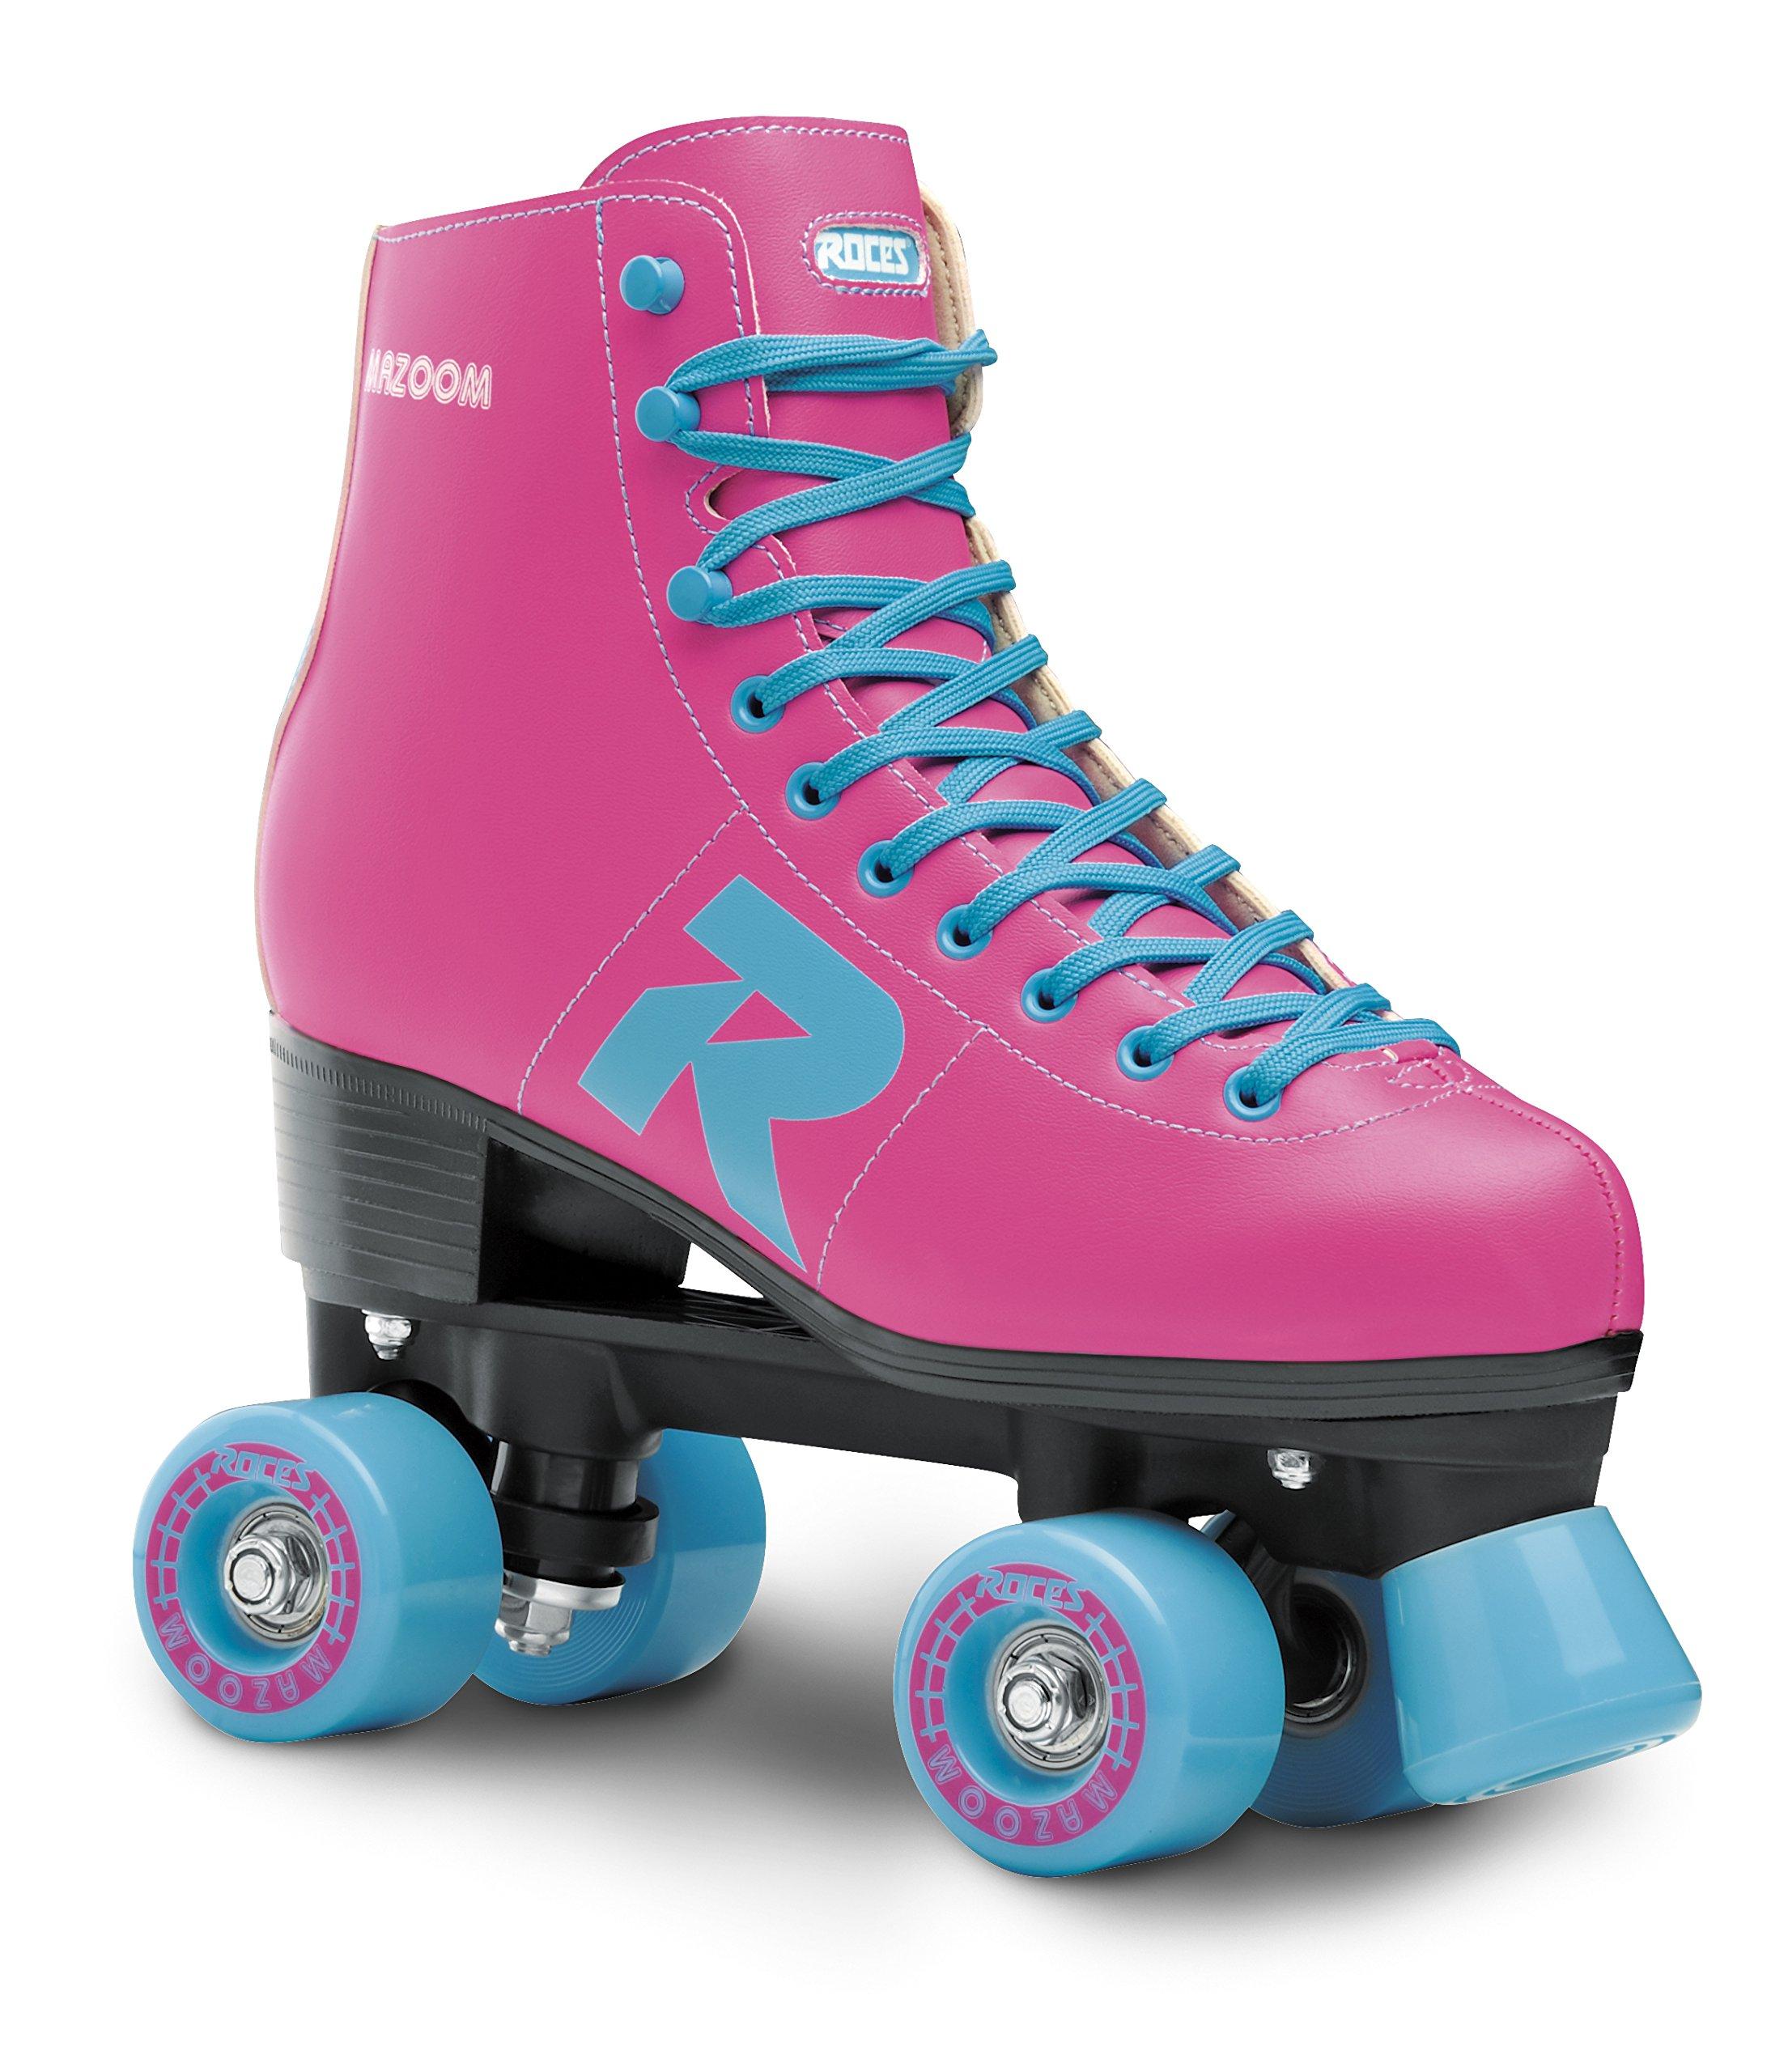 Roces 550064 Model Mazoom Roller Skate, US 8M/10W, Pink